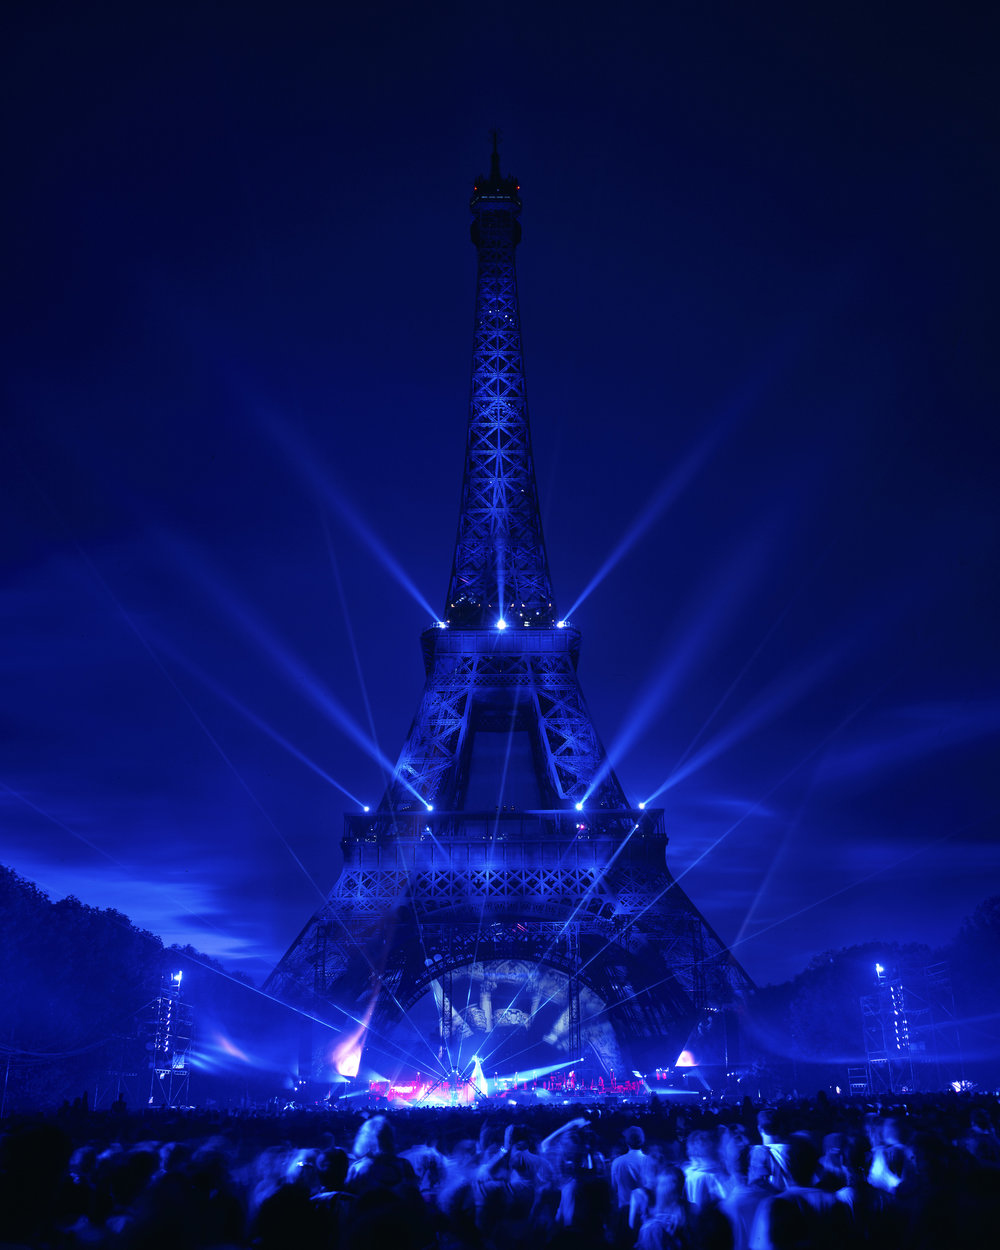 Tour Eiffel XIII - Paris